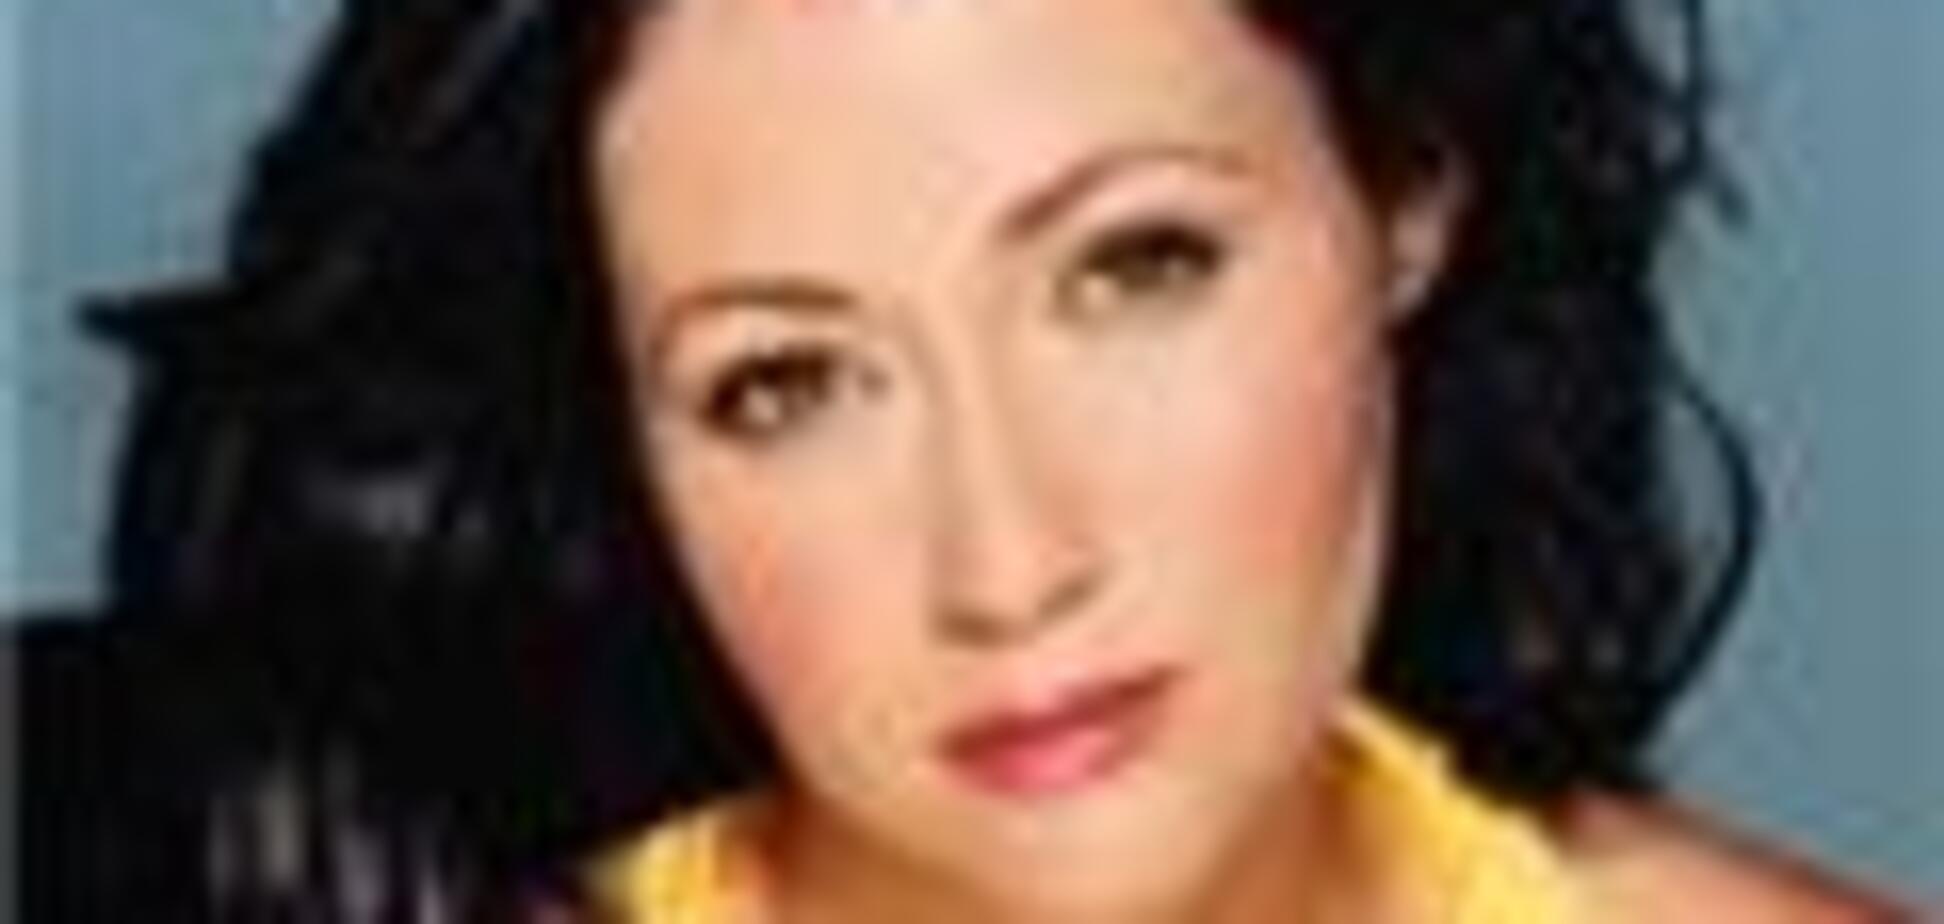 Бренда з 'Беверлі Хіллз 90210'. Не красуня, але чіпляє